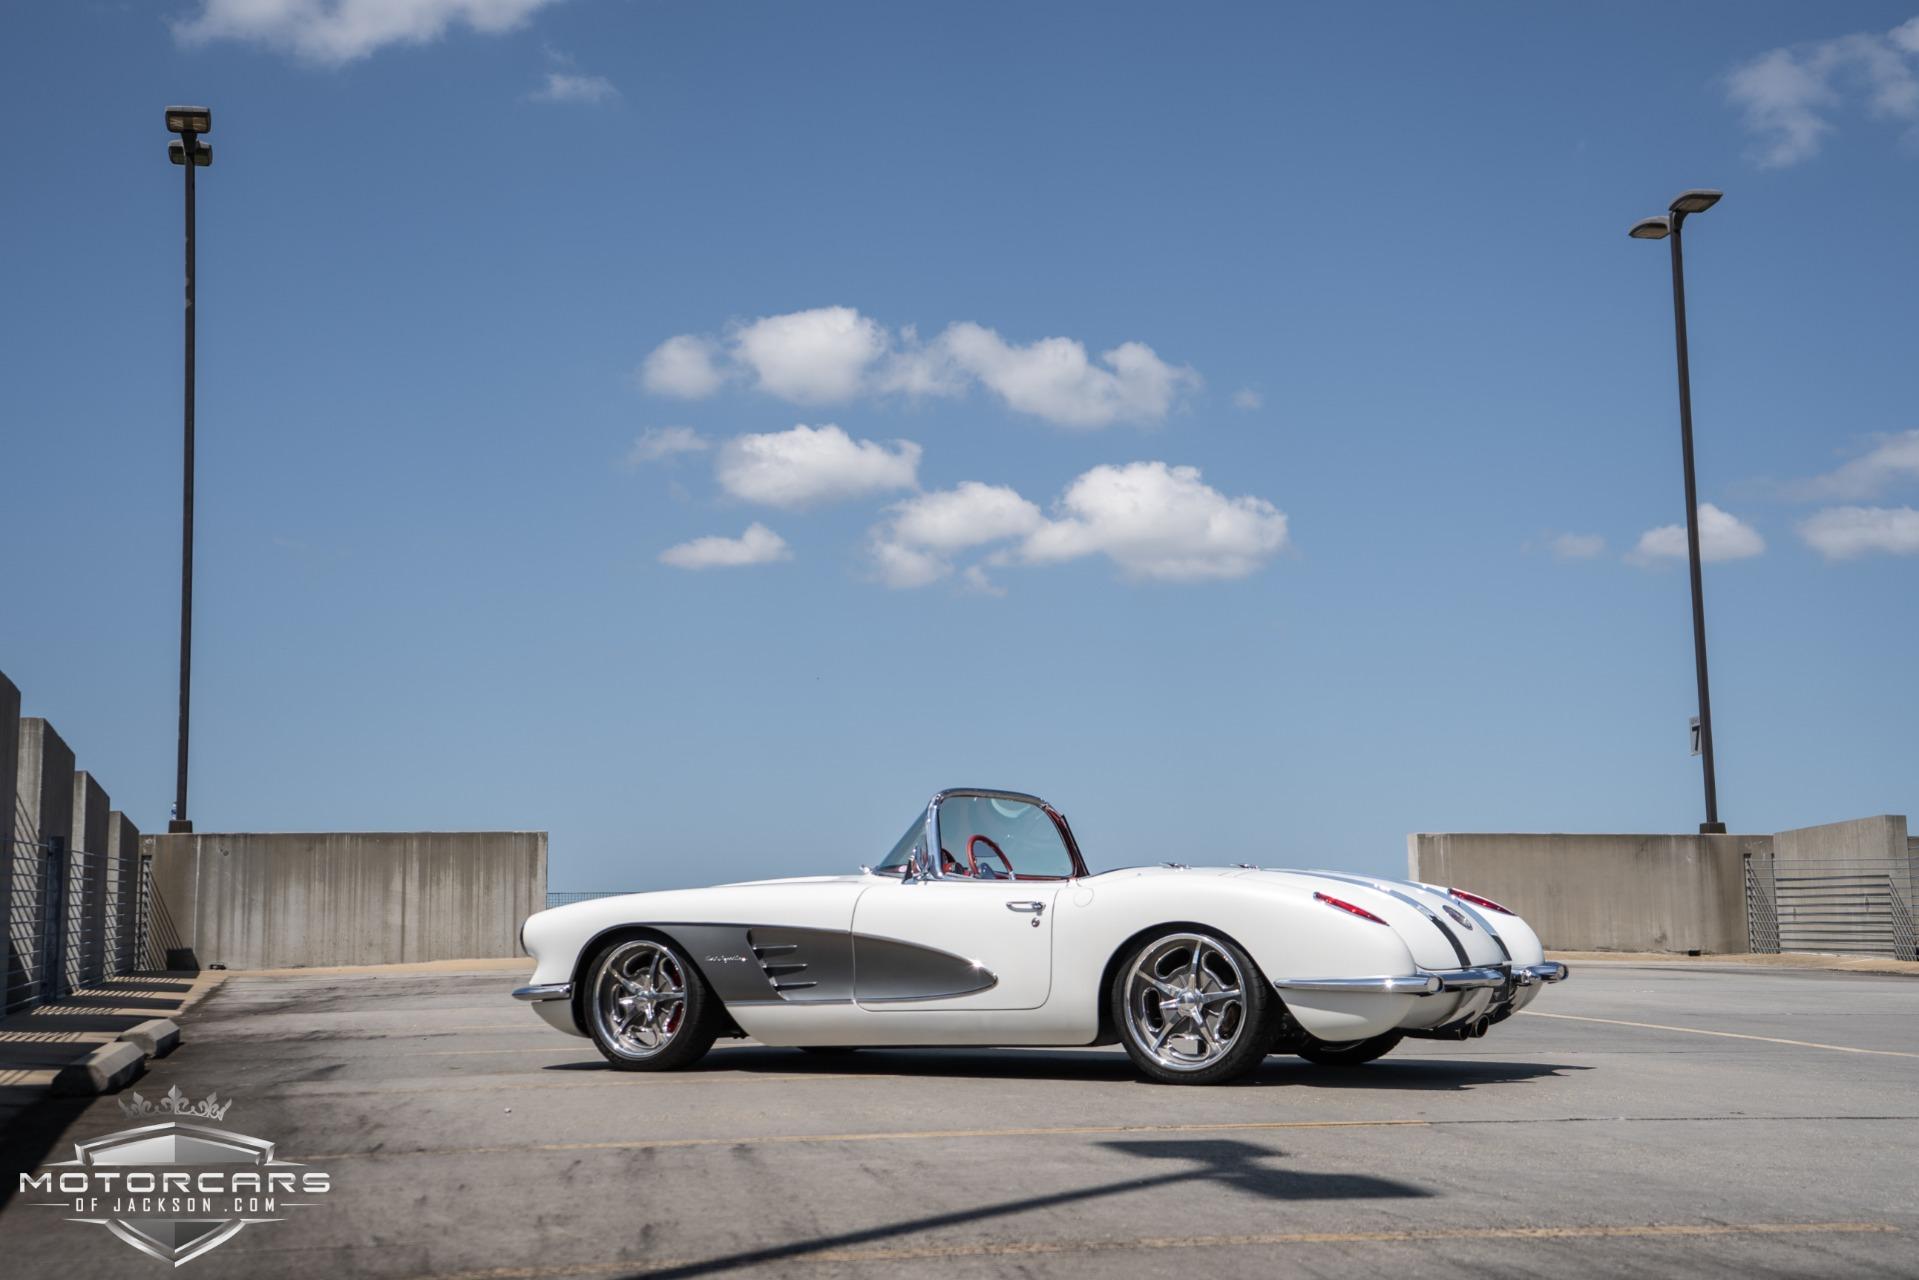 Used-1958-Chevrolet-Corvette-Show-Car-Jackson-MS